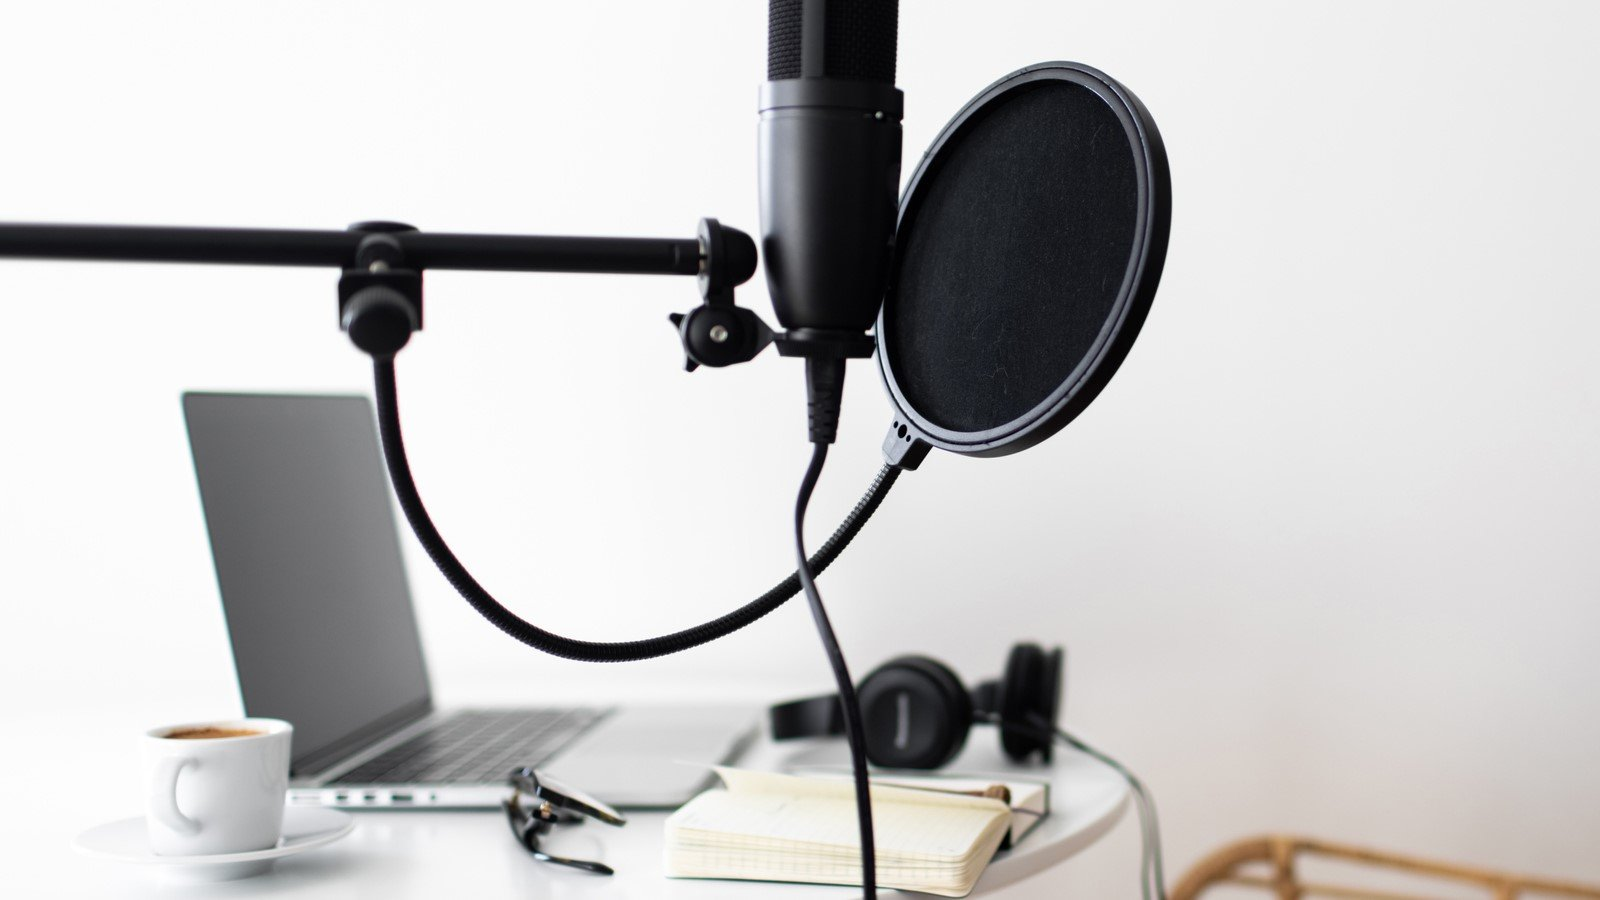 USB Mics, Podcasting from Home, mzStudios - Dallas Podcast Studios